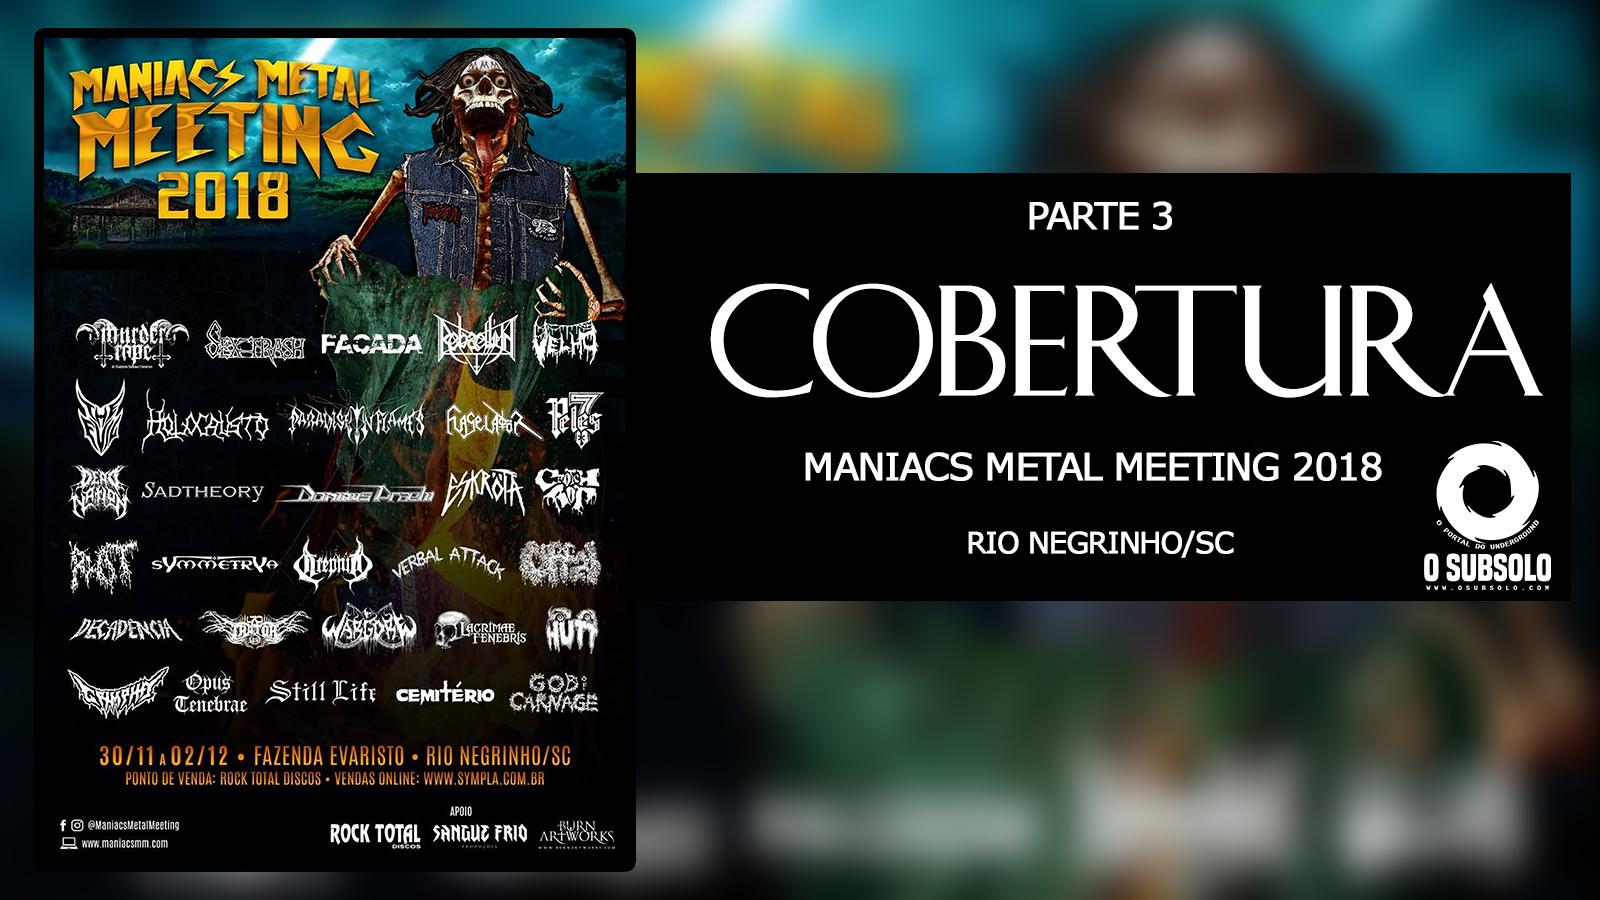 COBERTURA MANIACS METAL MEETING 2018 | O SUBSOLO